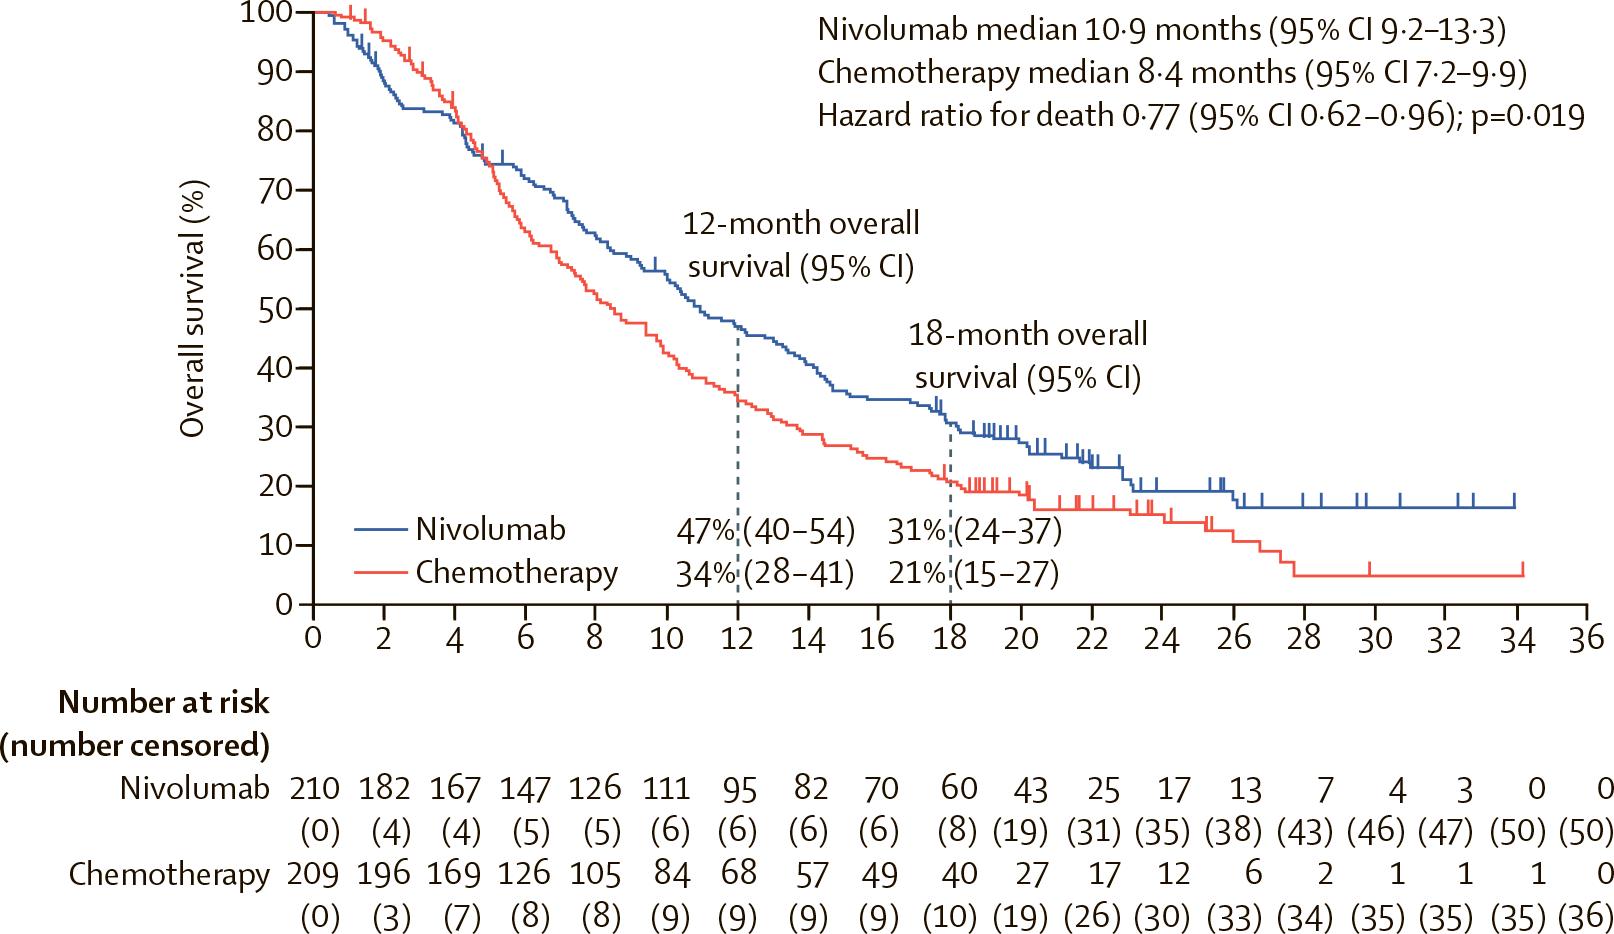 nct02569242 results 01 - Рак пищевода: назначайте «Опдиво» вместо химиотерапии